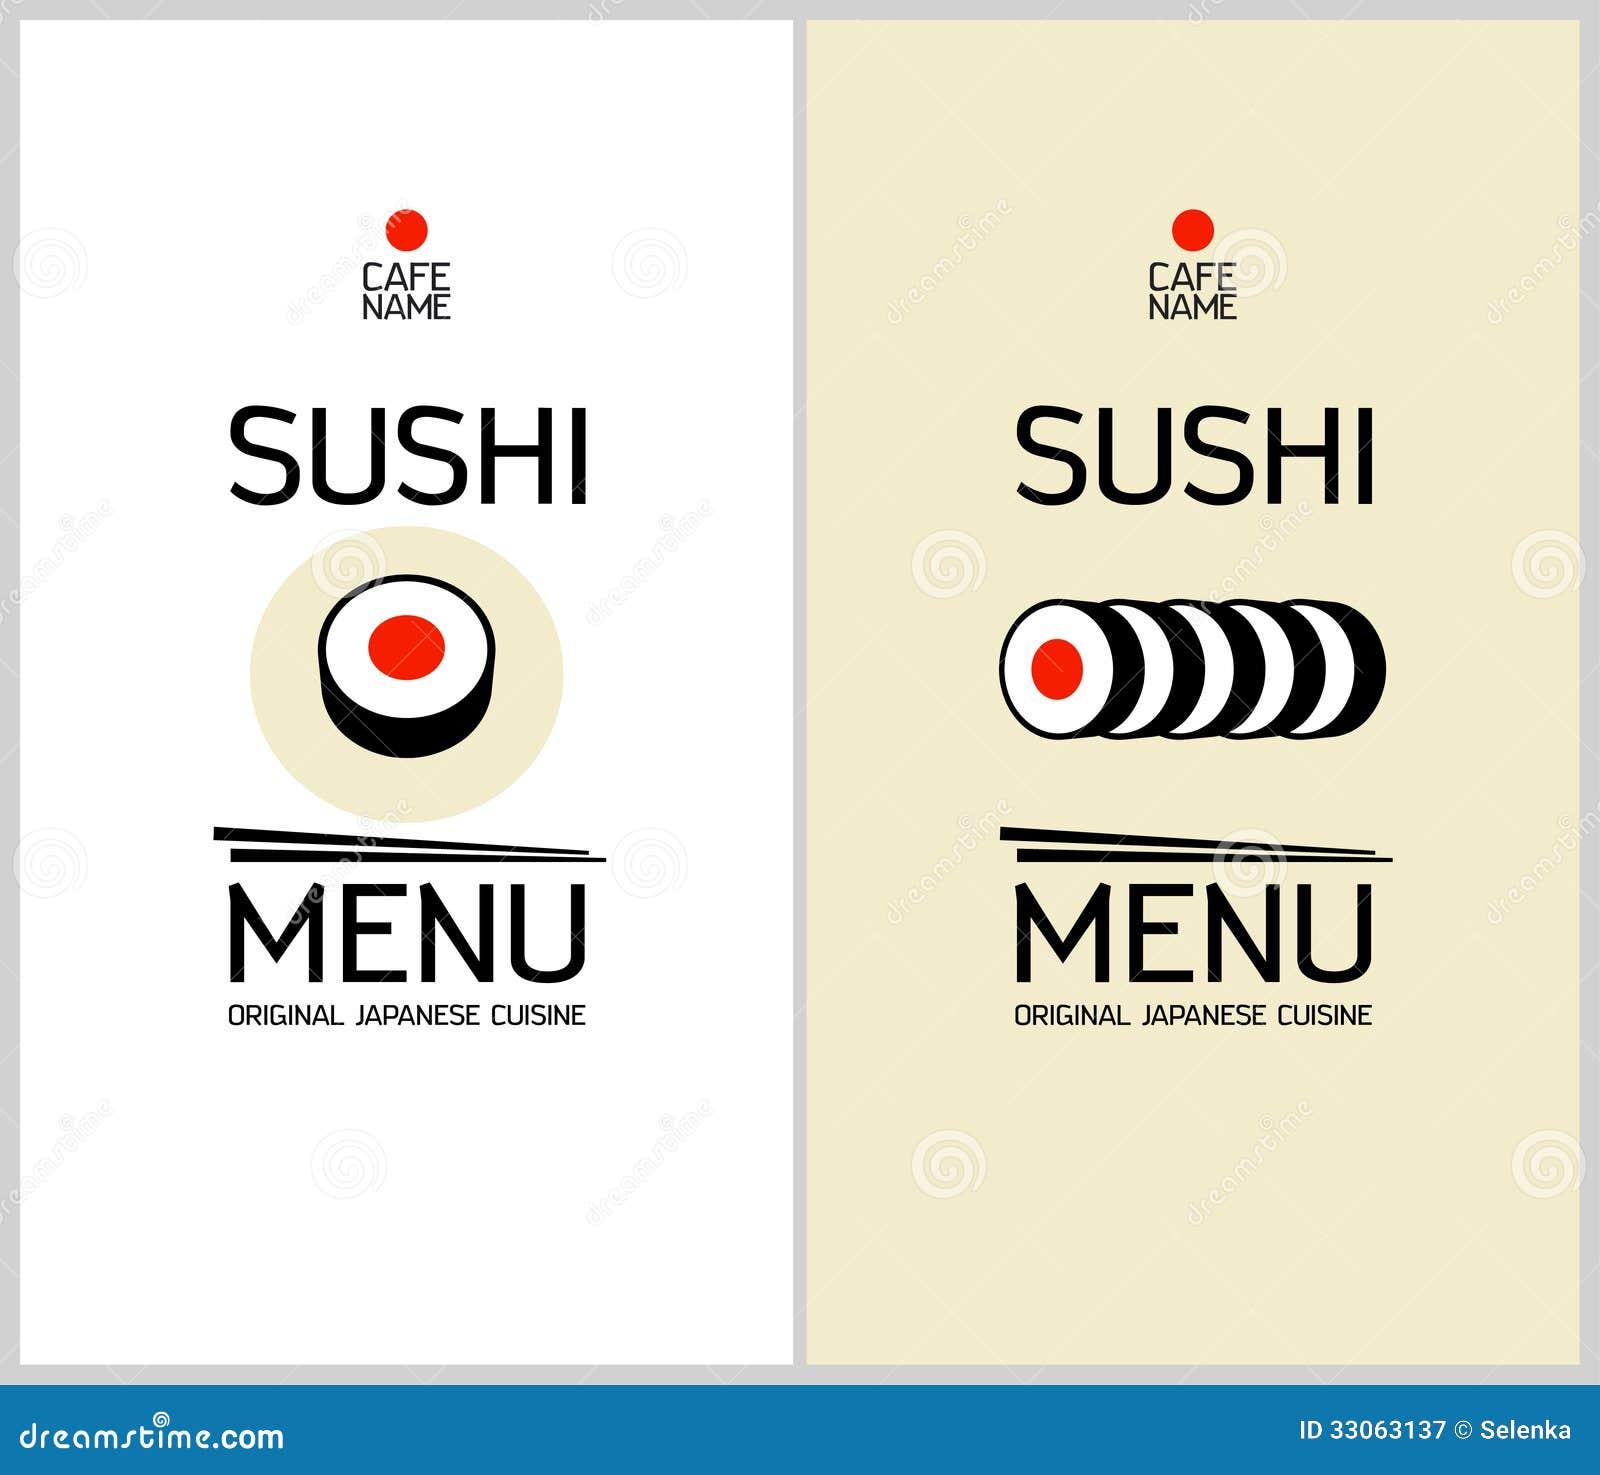 Sushi Menu Design Template Royalty Free Stock Photography